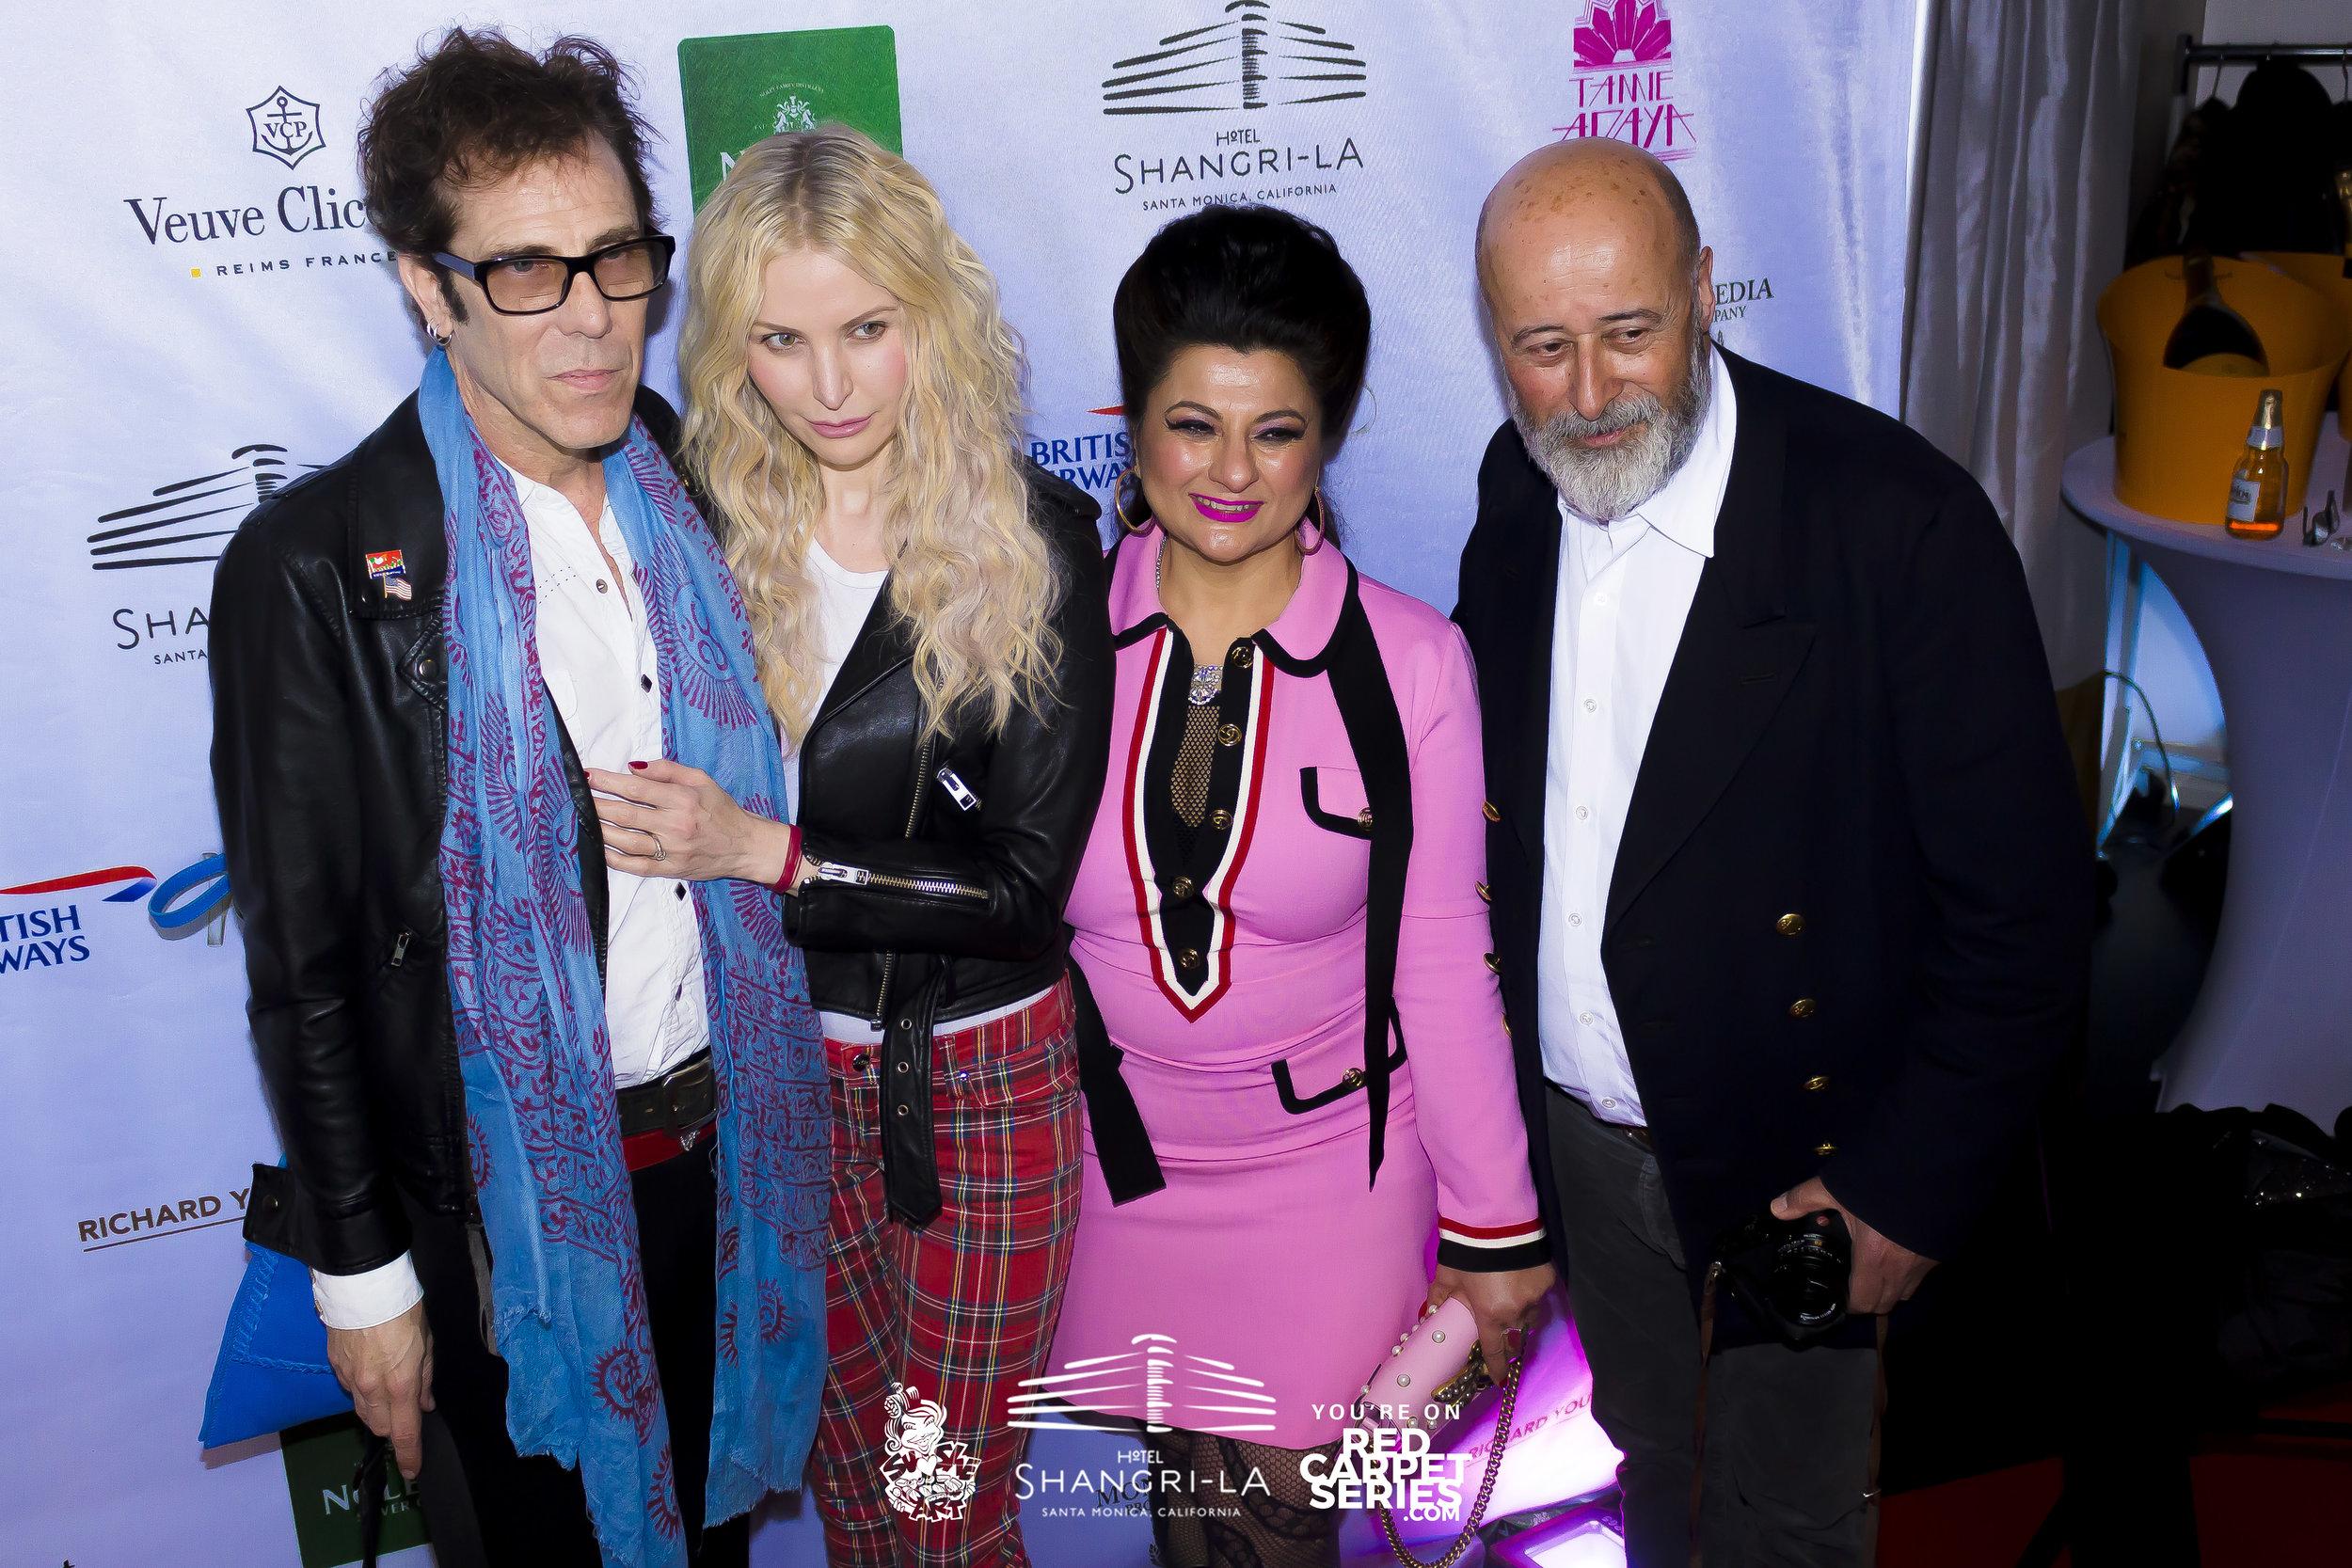 Shangri-la Diamond Jubilee - 03-11-19_87.jpg